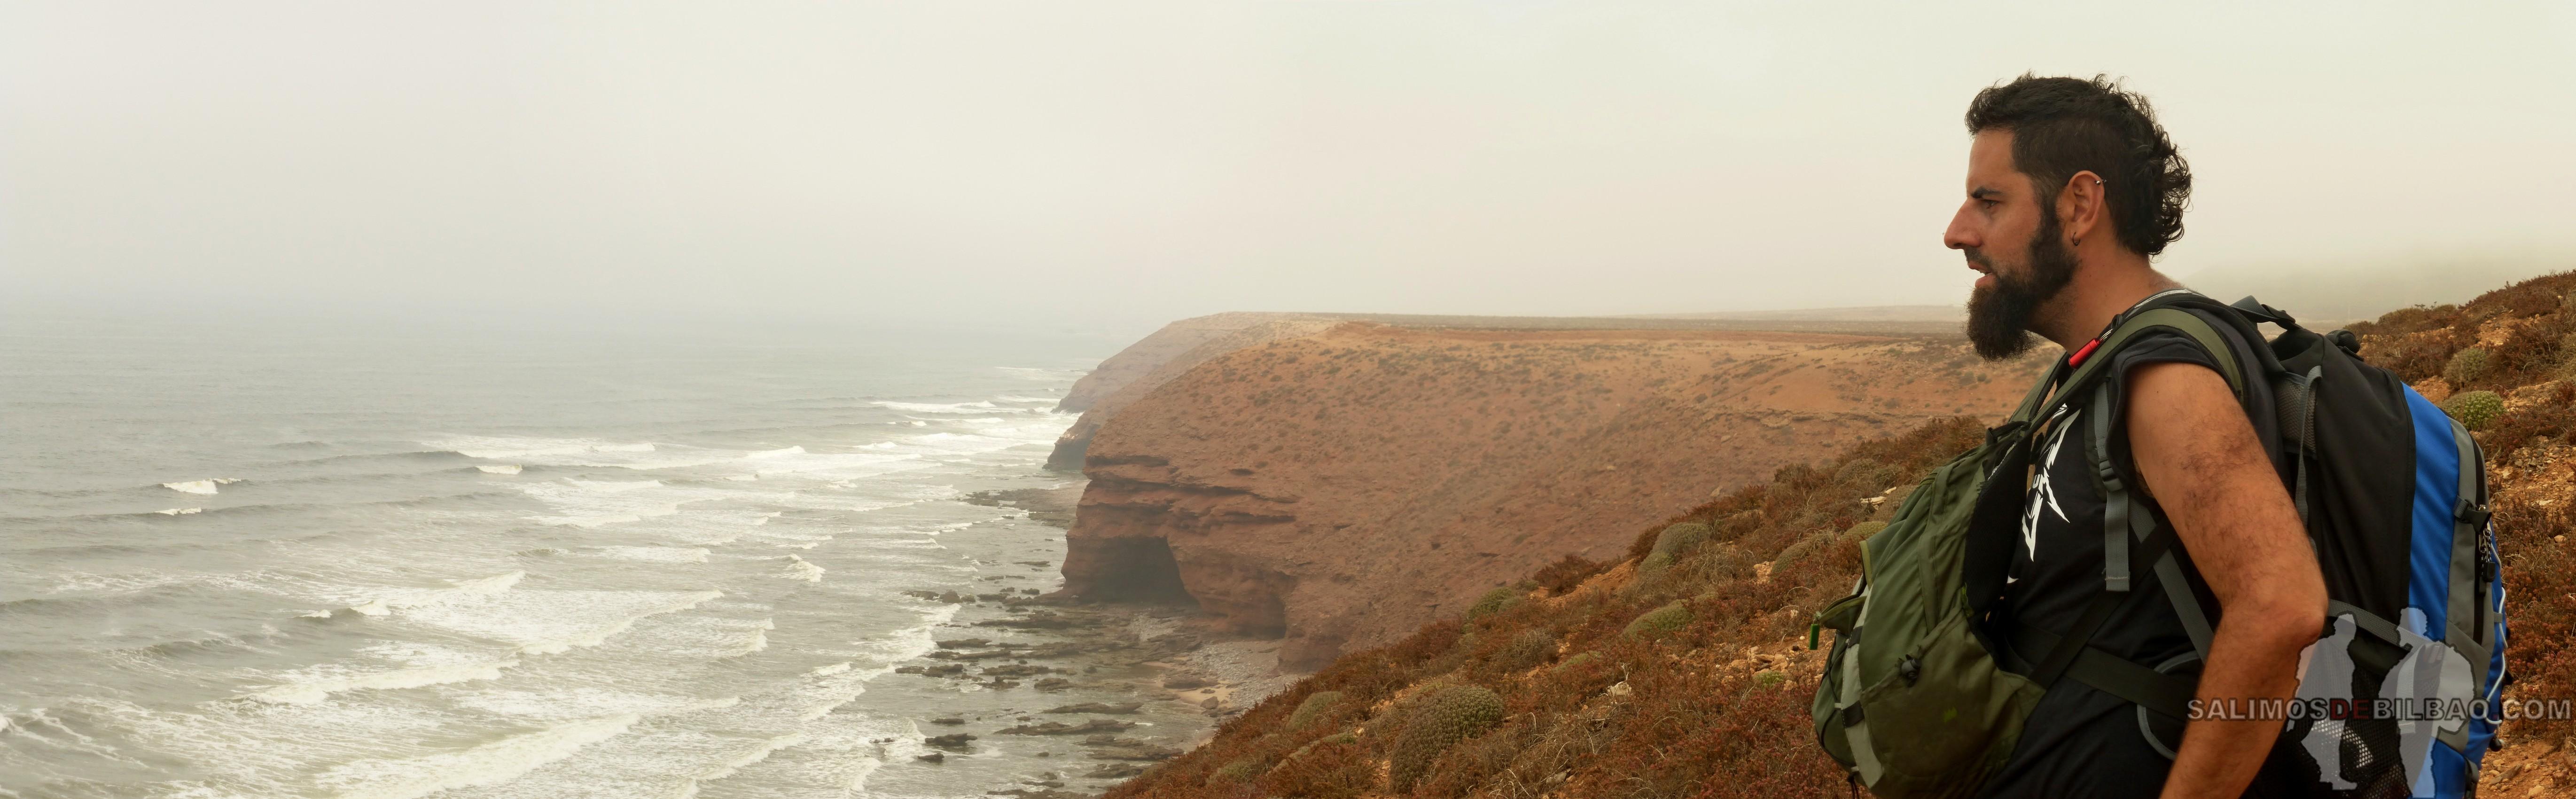 363. Katz, Pano, Camino de Sidi Ifni a Legzira